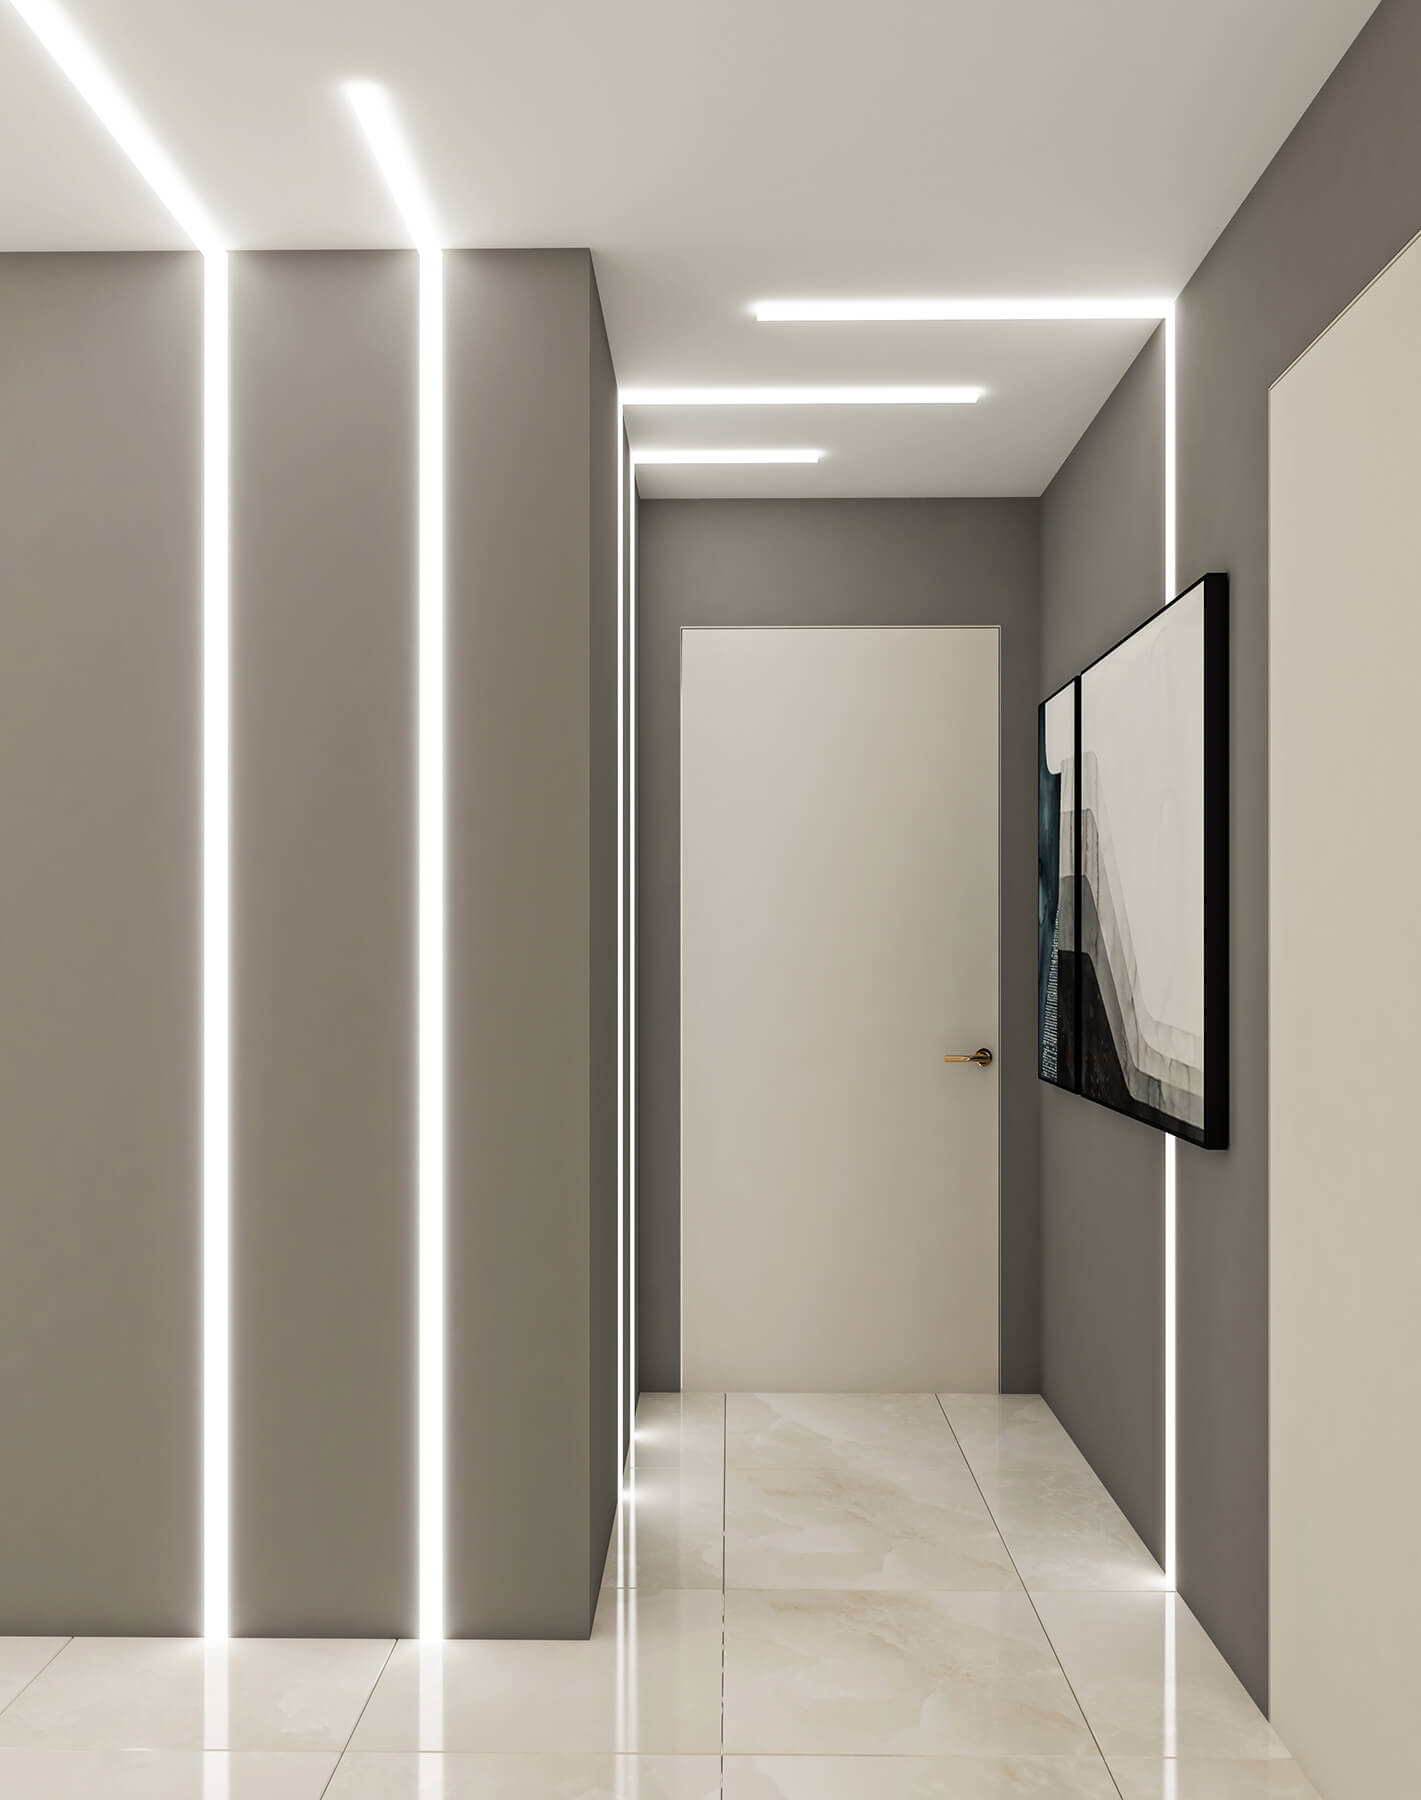 interioren dizain proekt na koridor proekt orbis